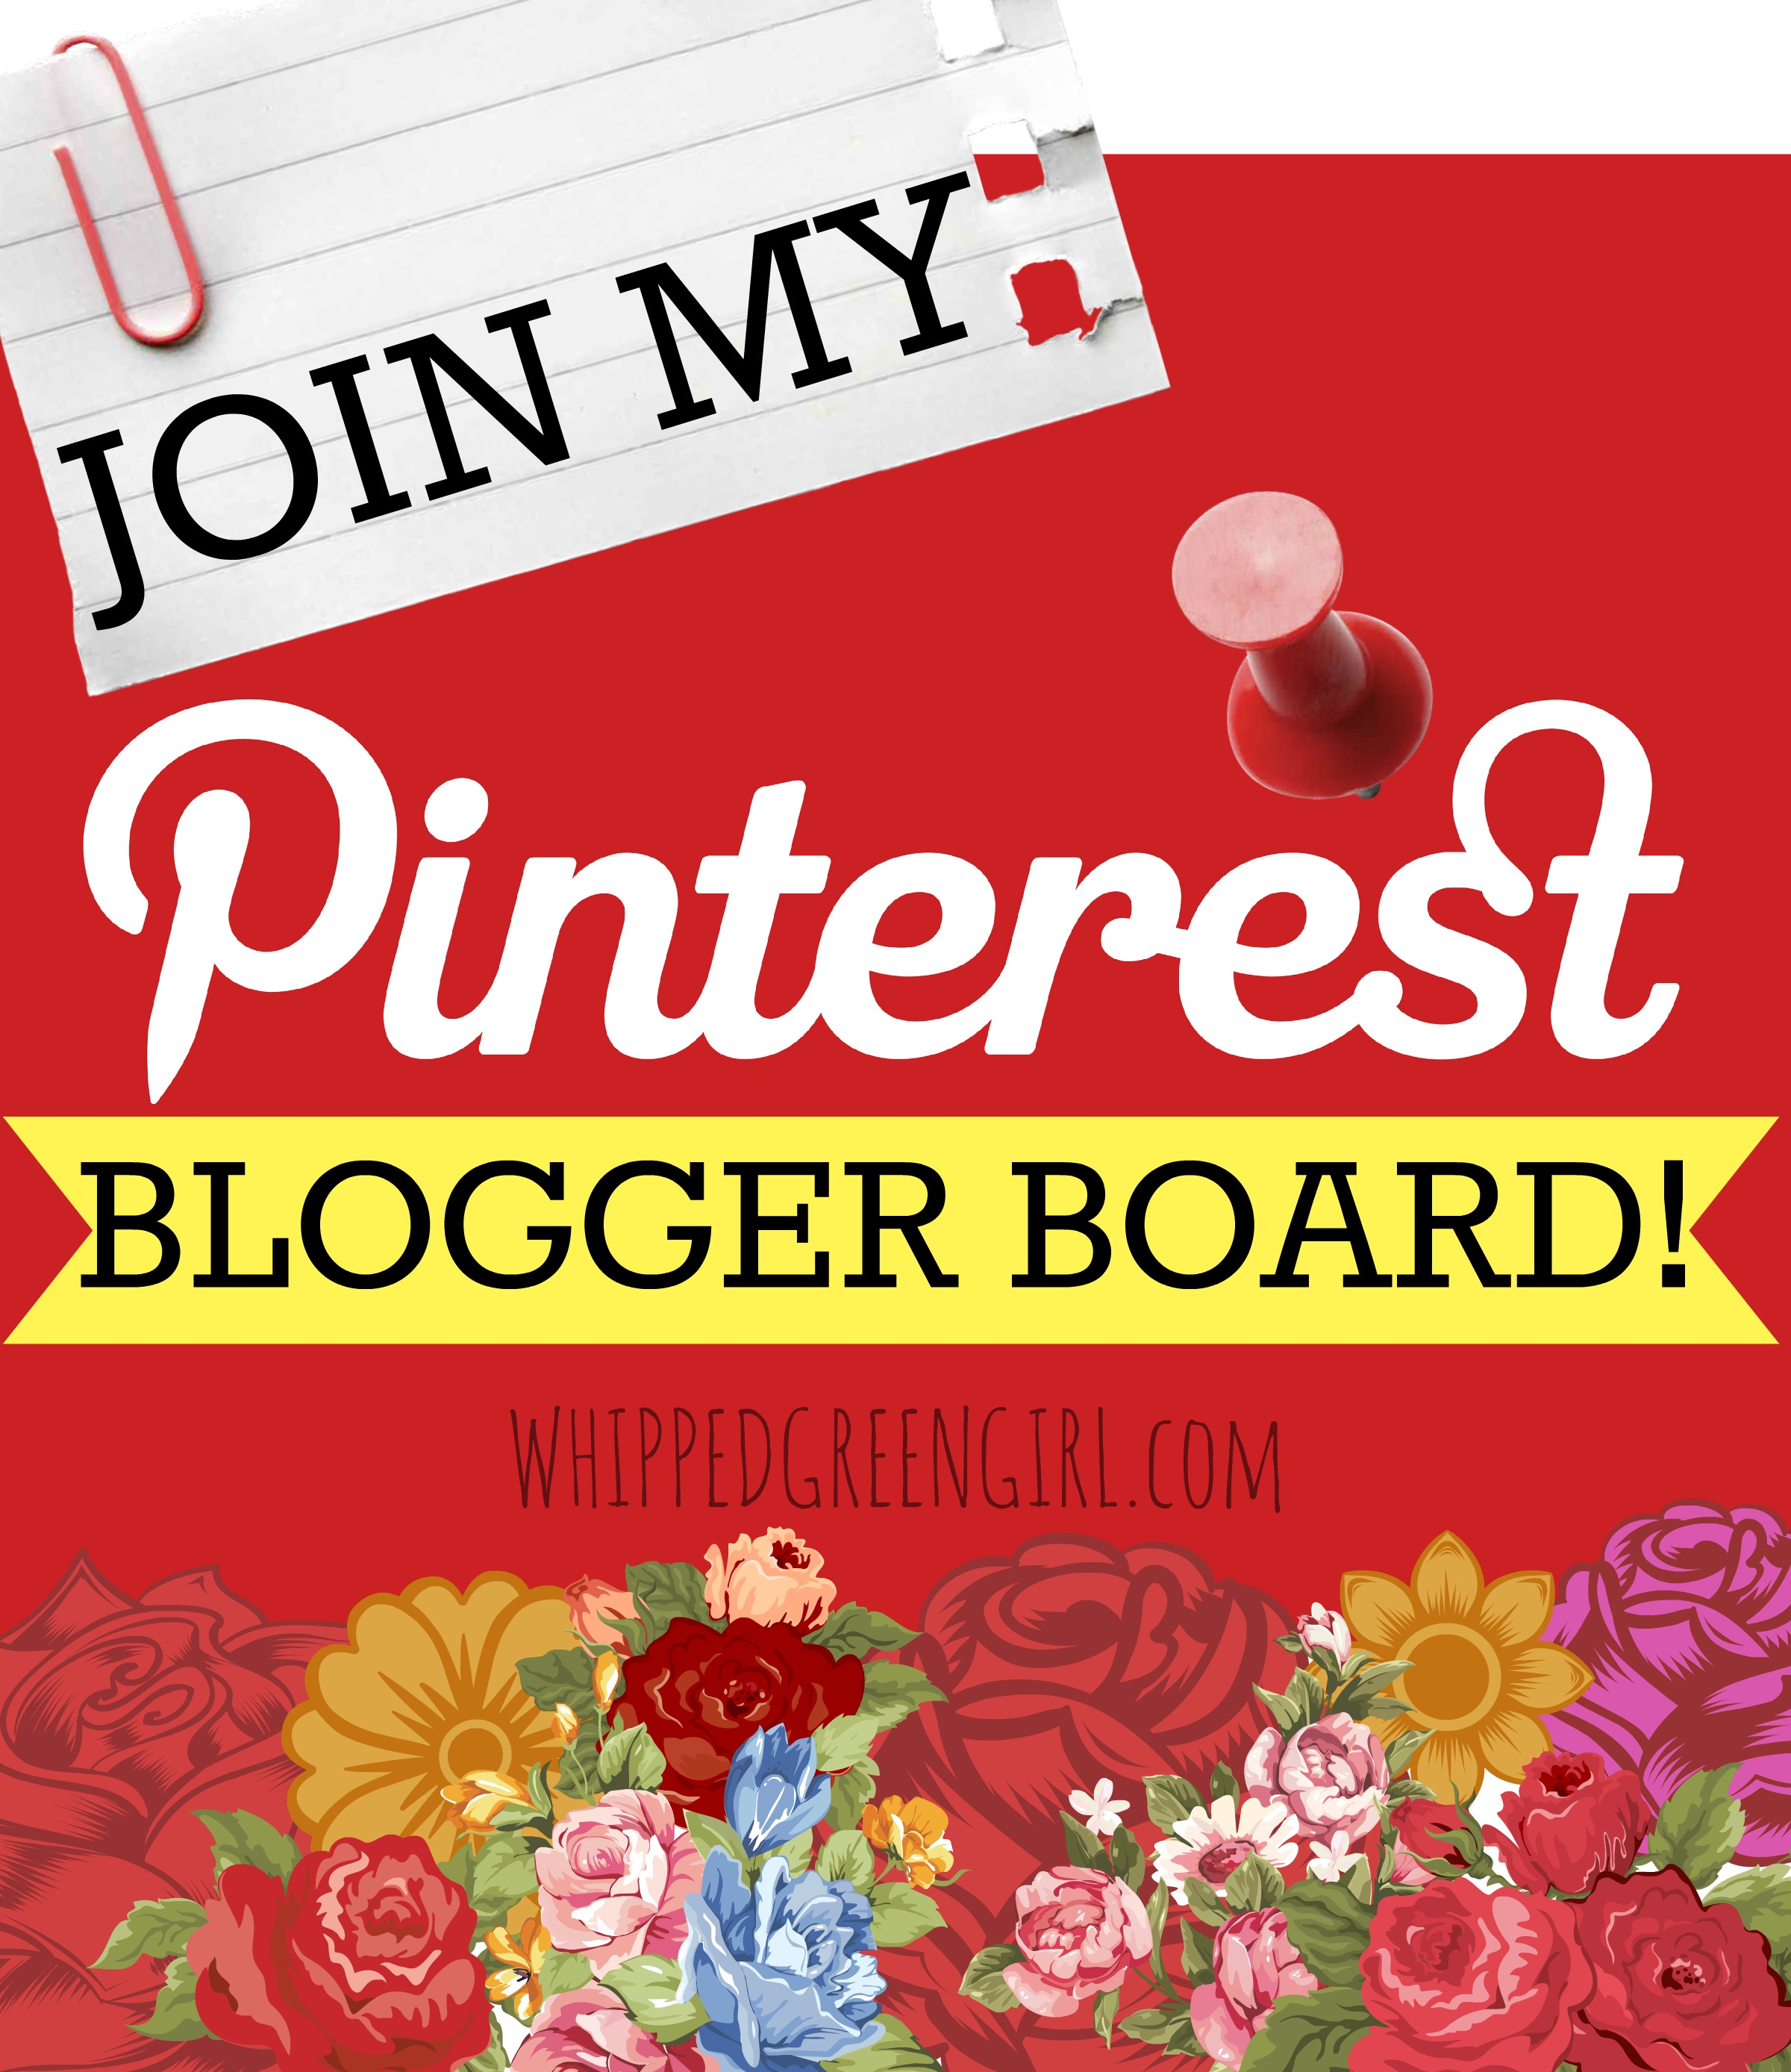 WhippedGreenGirl.com - Join Pinterest Blogger Board - #Pinterest #Collaboration #Bloggers #Promote